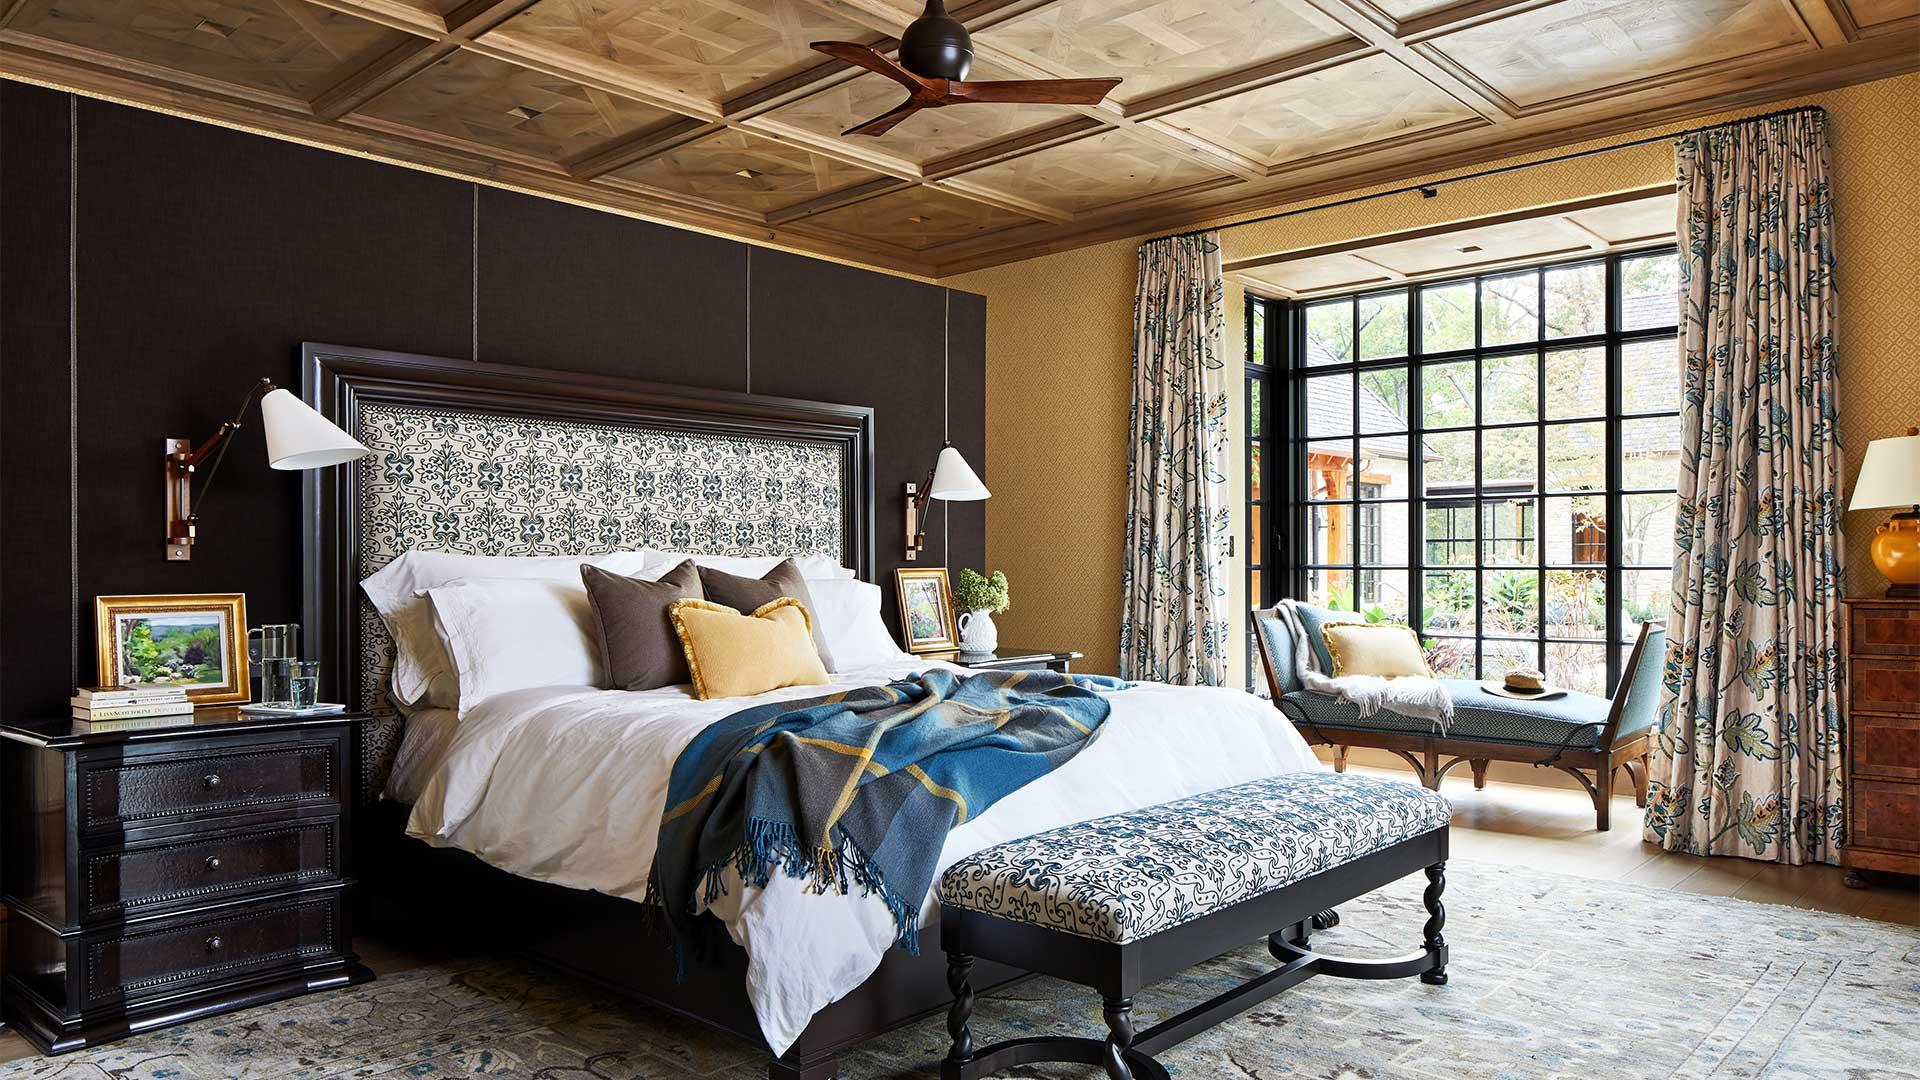 Bedroom with steel glazed windows